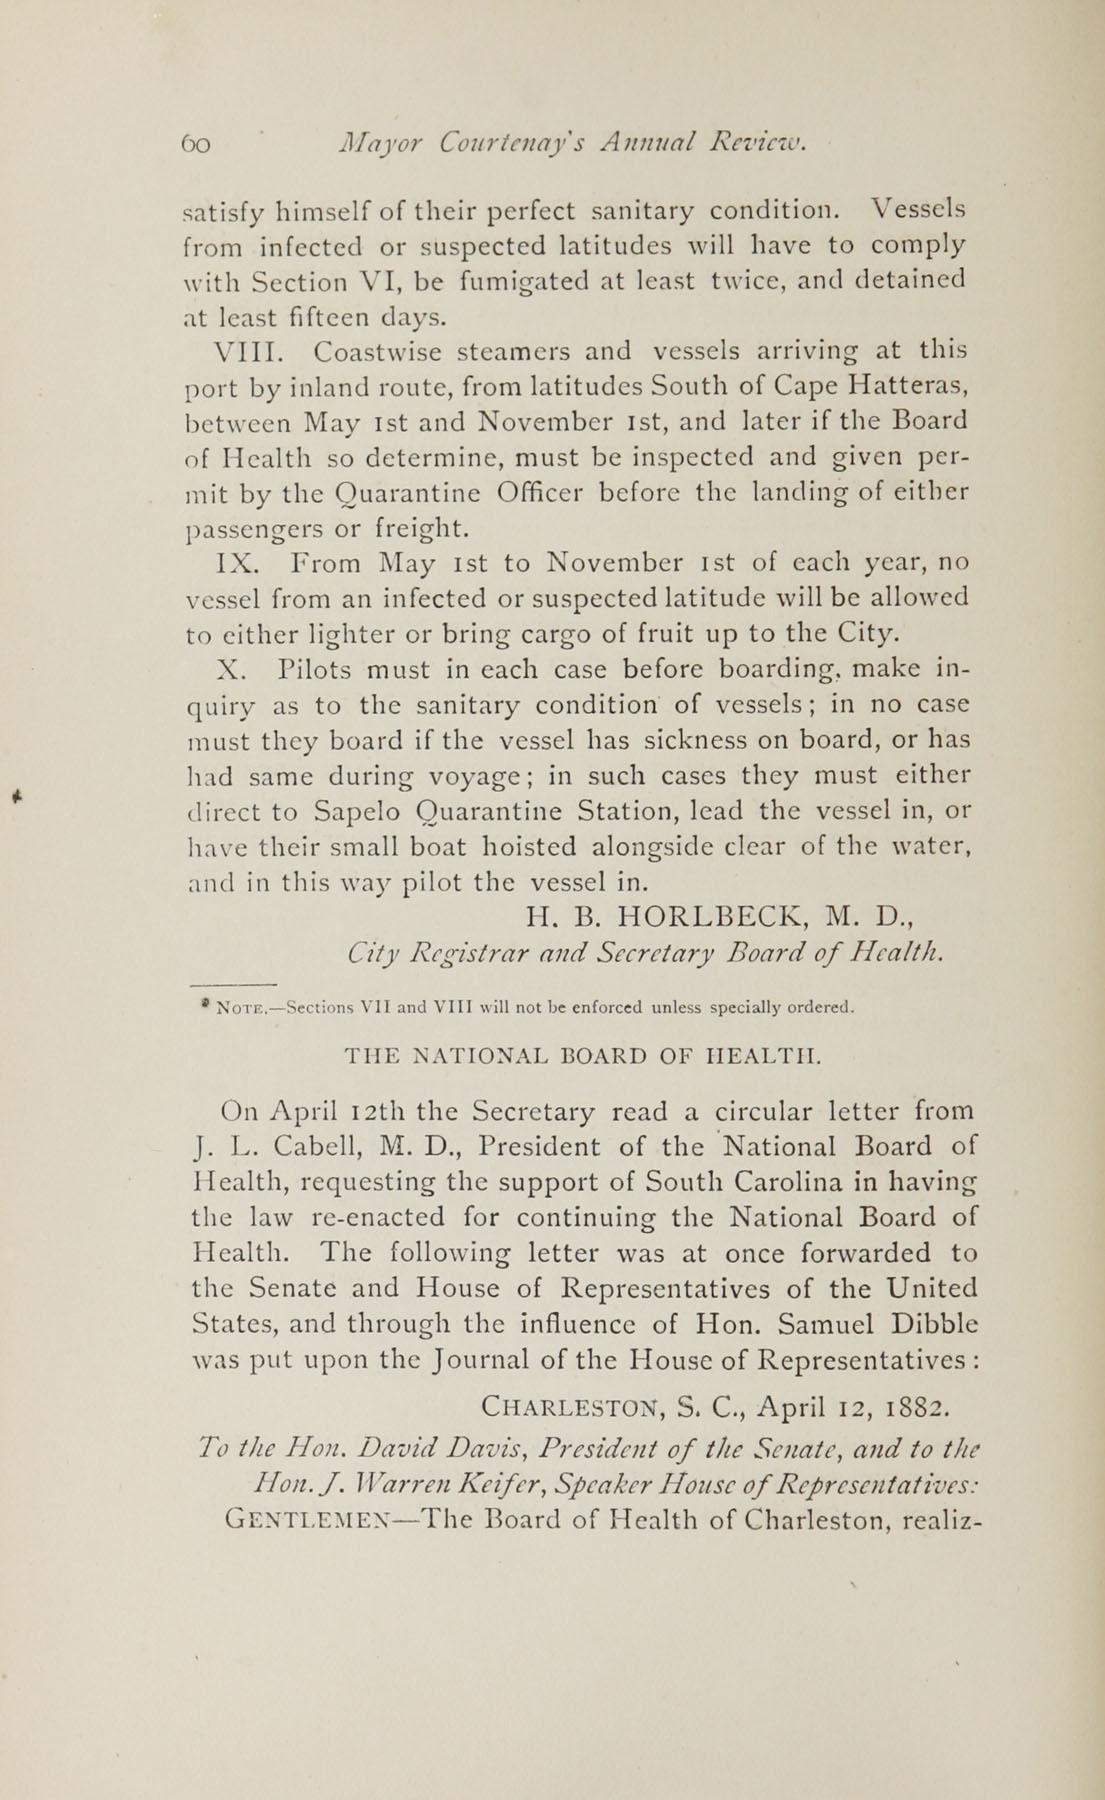 Charleston Yearbook, 1882, page 60